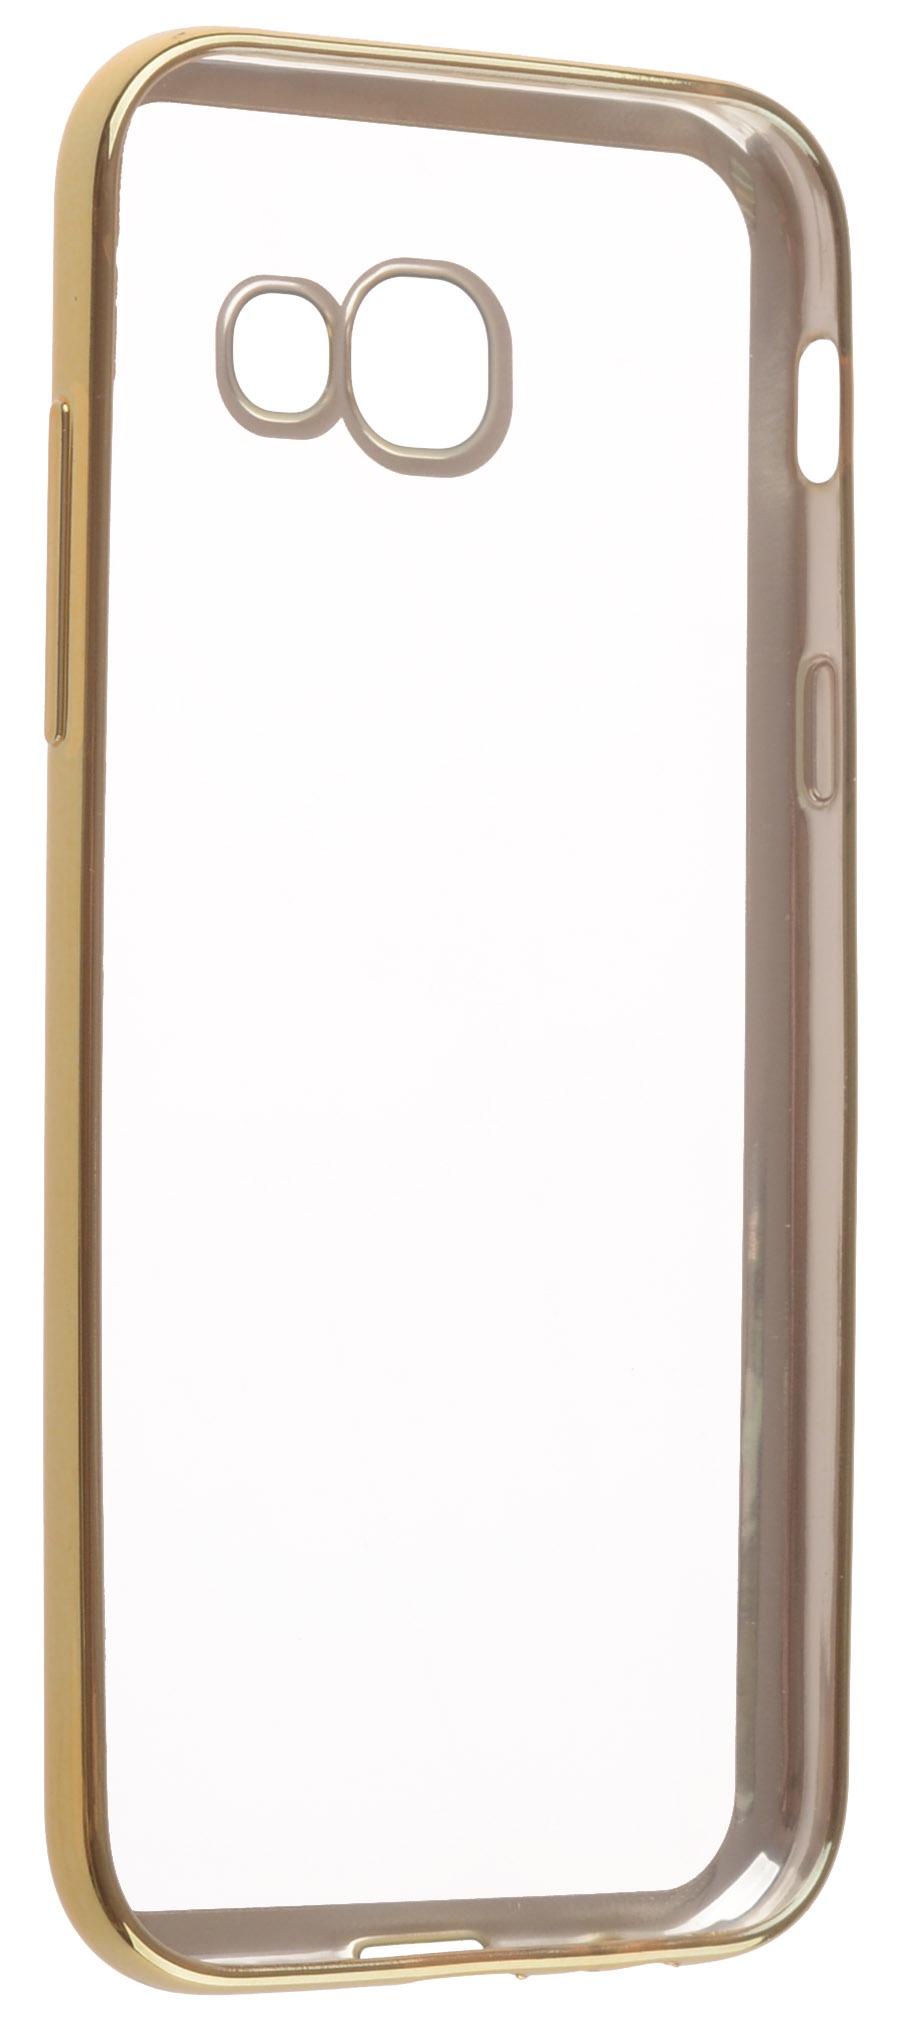 Чехол для сотового телефона skinBOX Silicone chrome border, 4660041408225, золотой аксессуар чехол накладка innovation silicone 0 33mm для apple iphone 5 5s transparent 12001